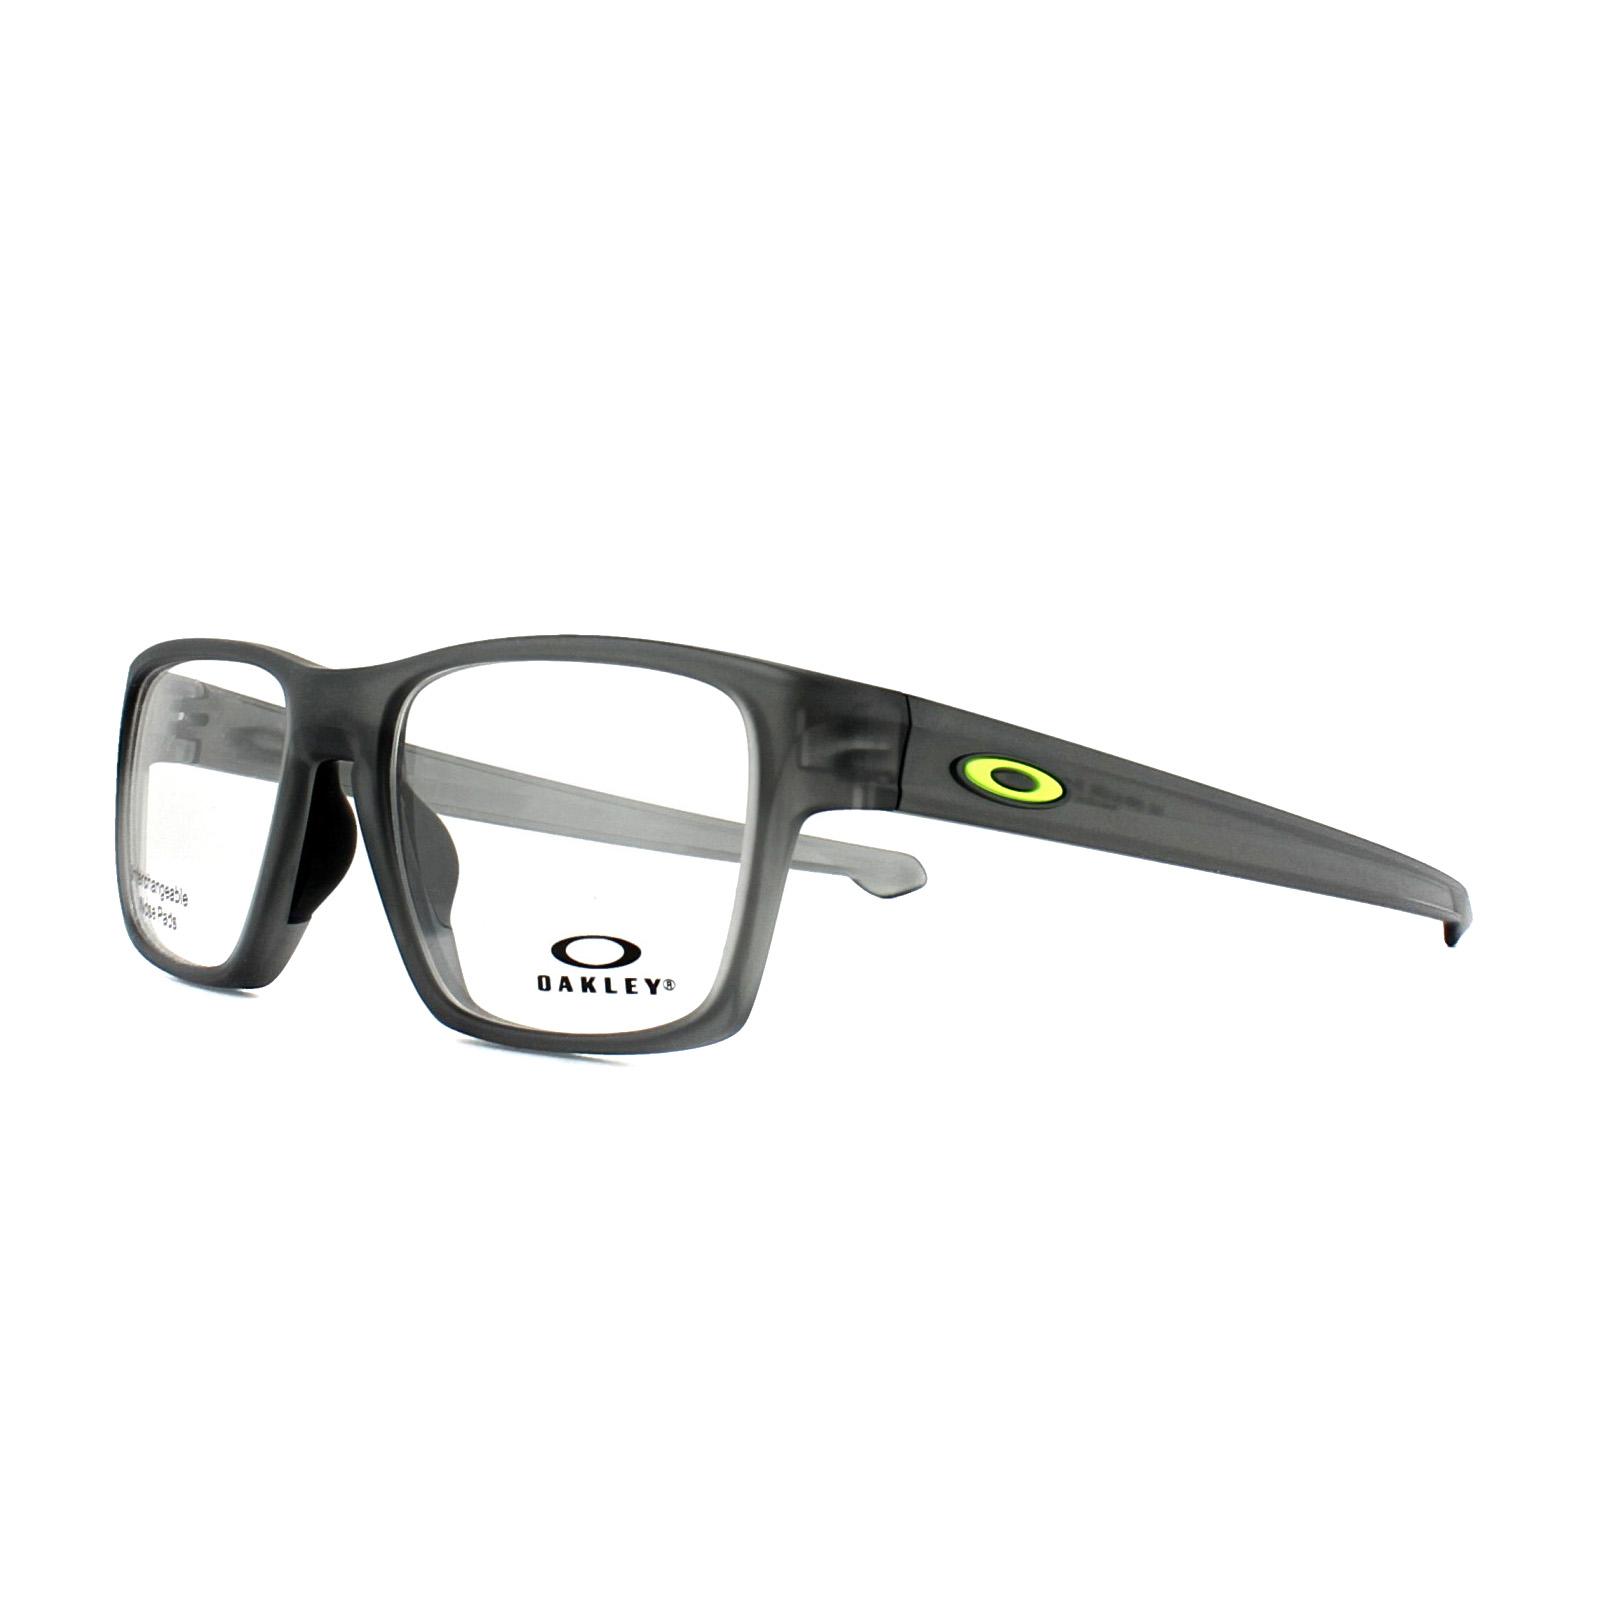 115fa032add2c Sentinel Oakley Glasses Frames Litebeam OX8140-02 Satin Grey Smoke 53mm Mens